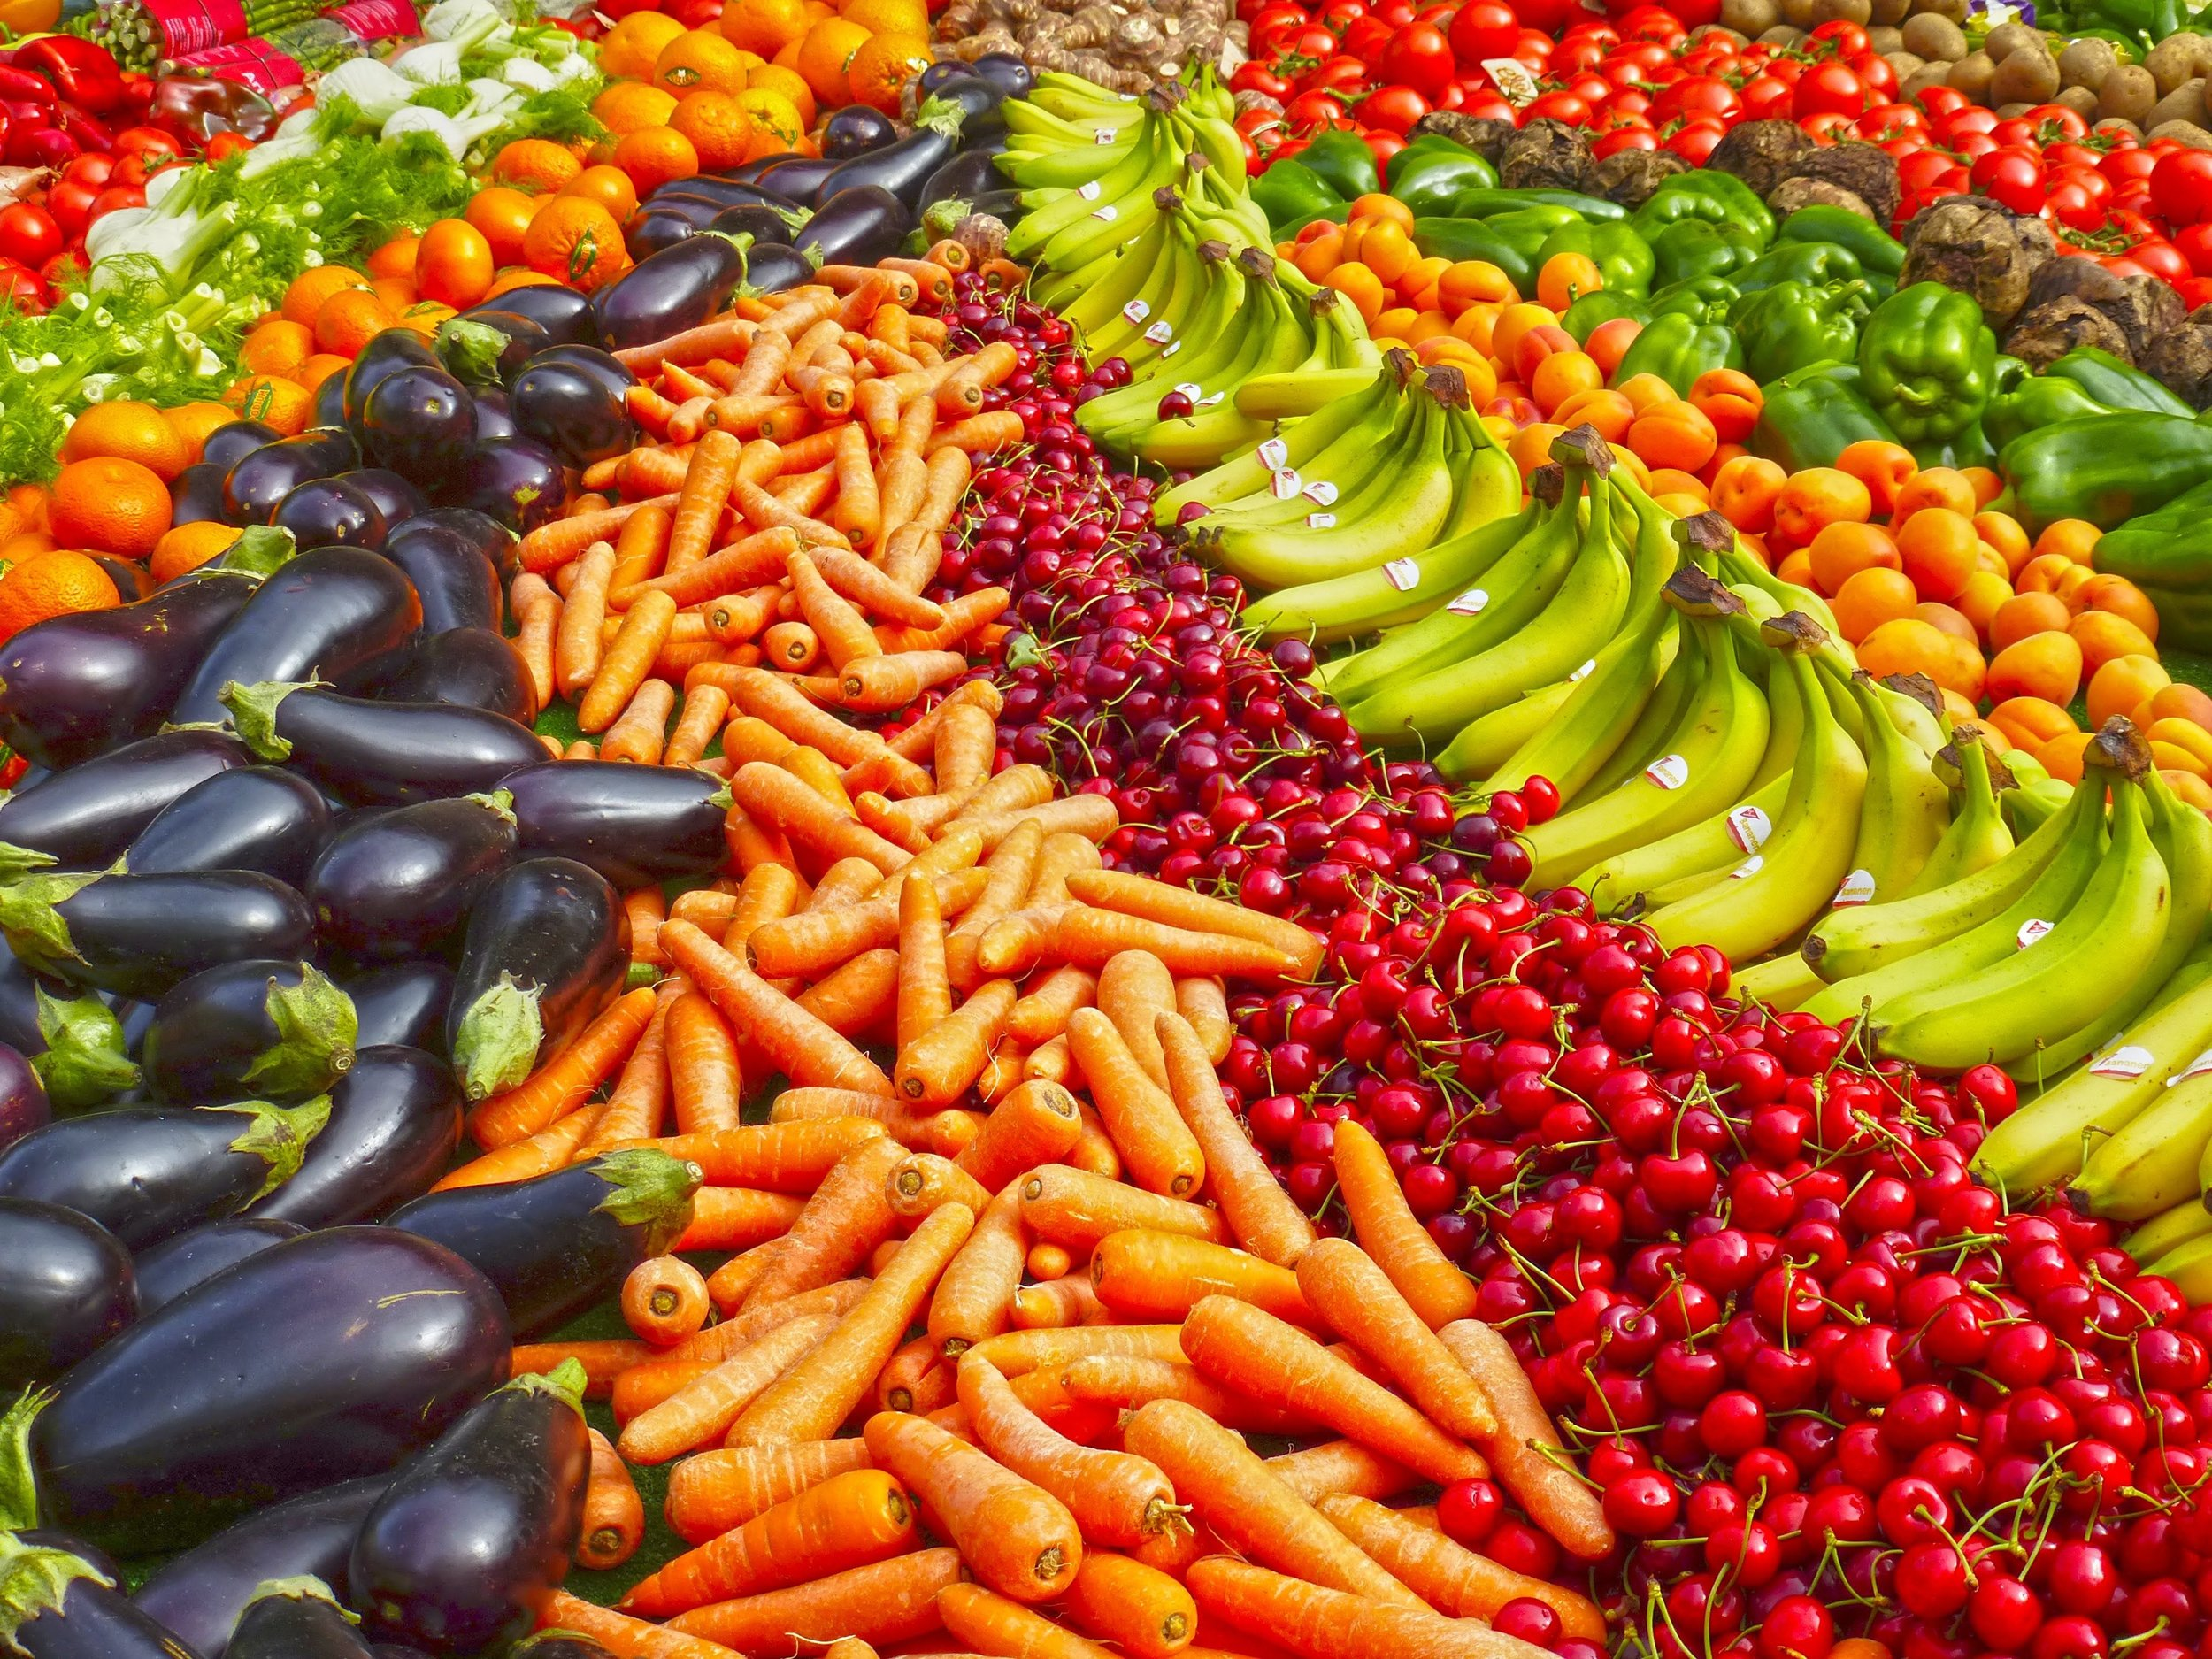 114 abundance-agriculture-bananas-264537.jpg